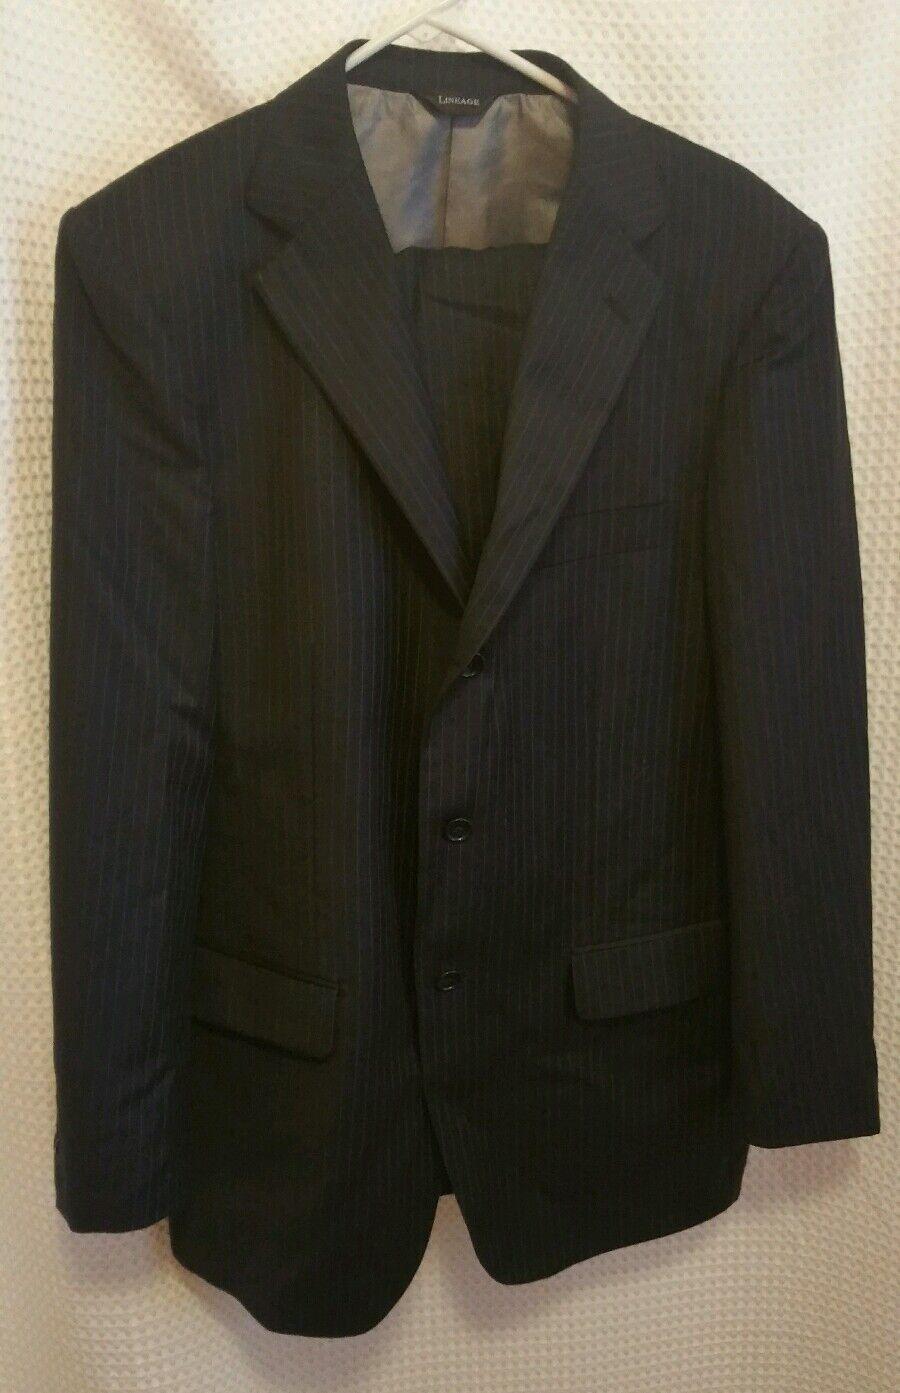 Lineage Navy Blau Pinstripe Wool 38R 3 Button Jacket & Pants 32R 2 Piece Suit